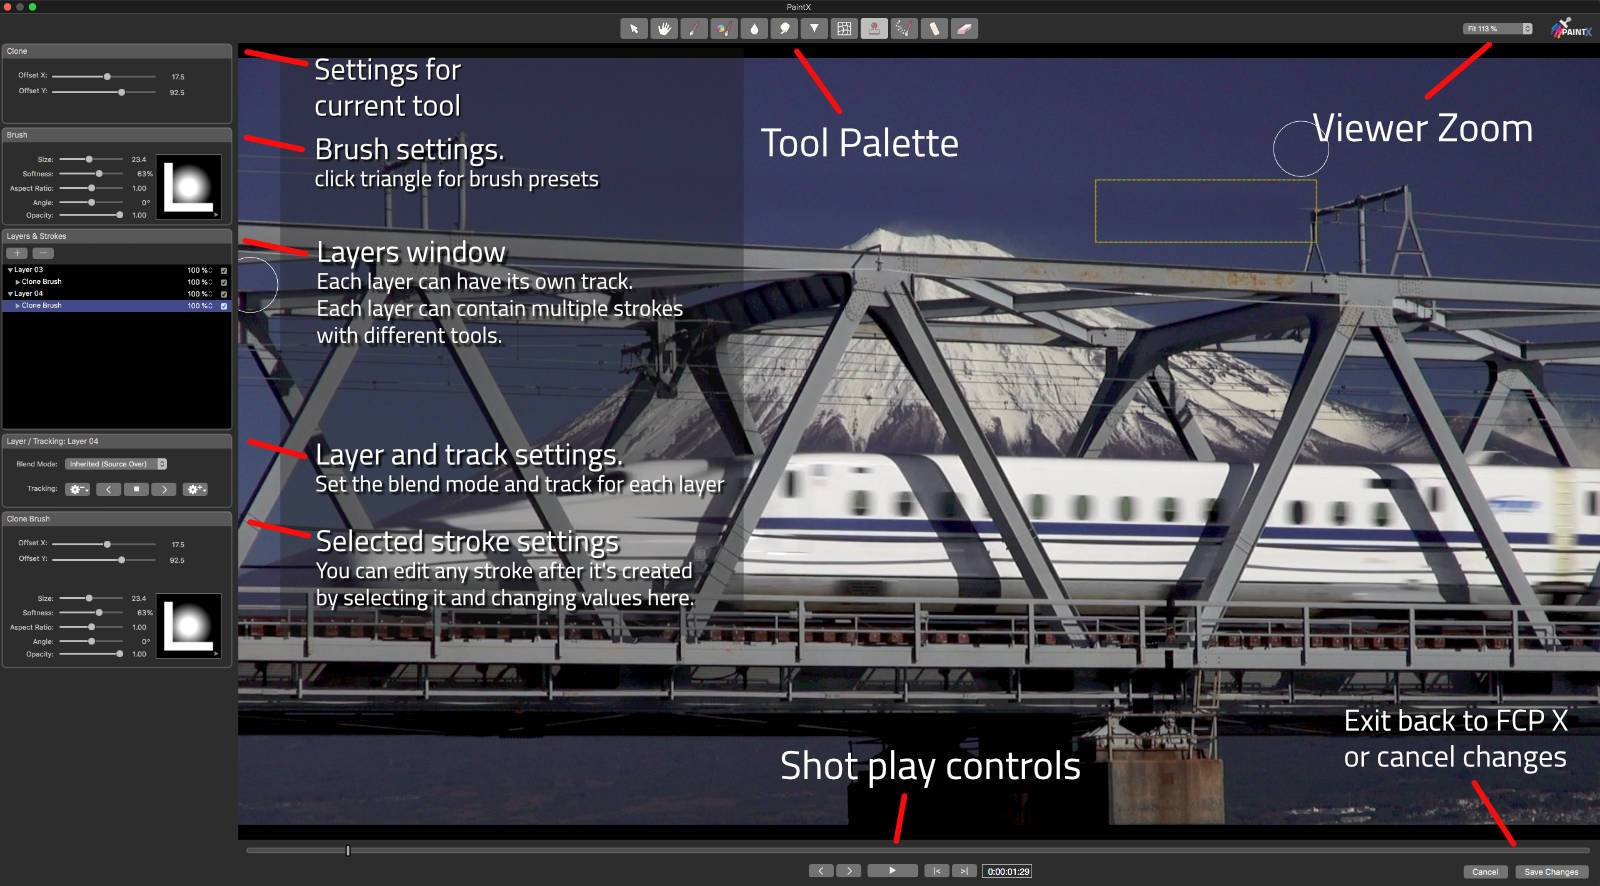 PaintX Interface